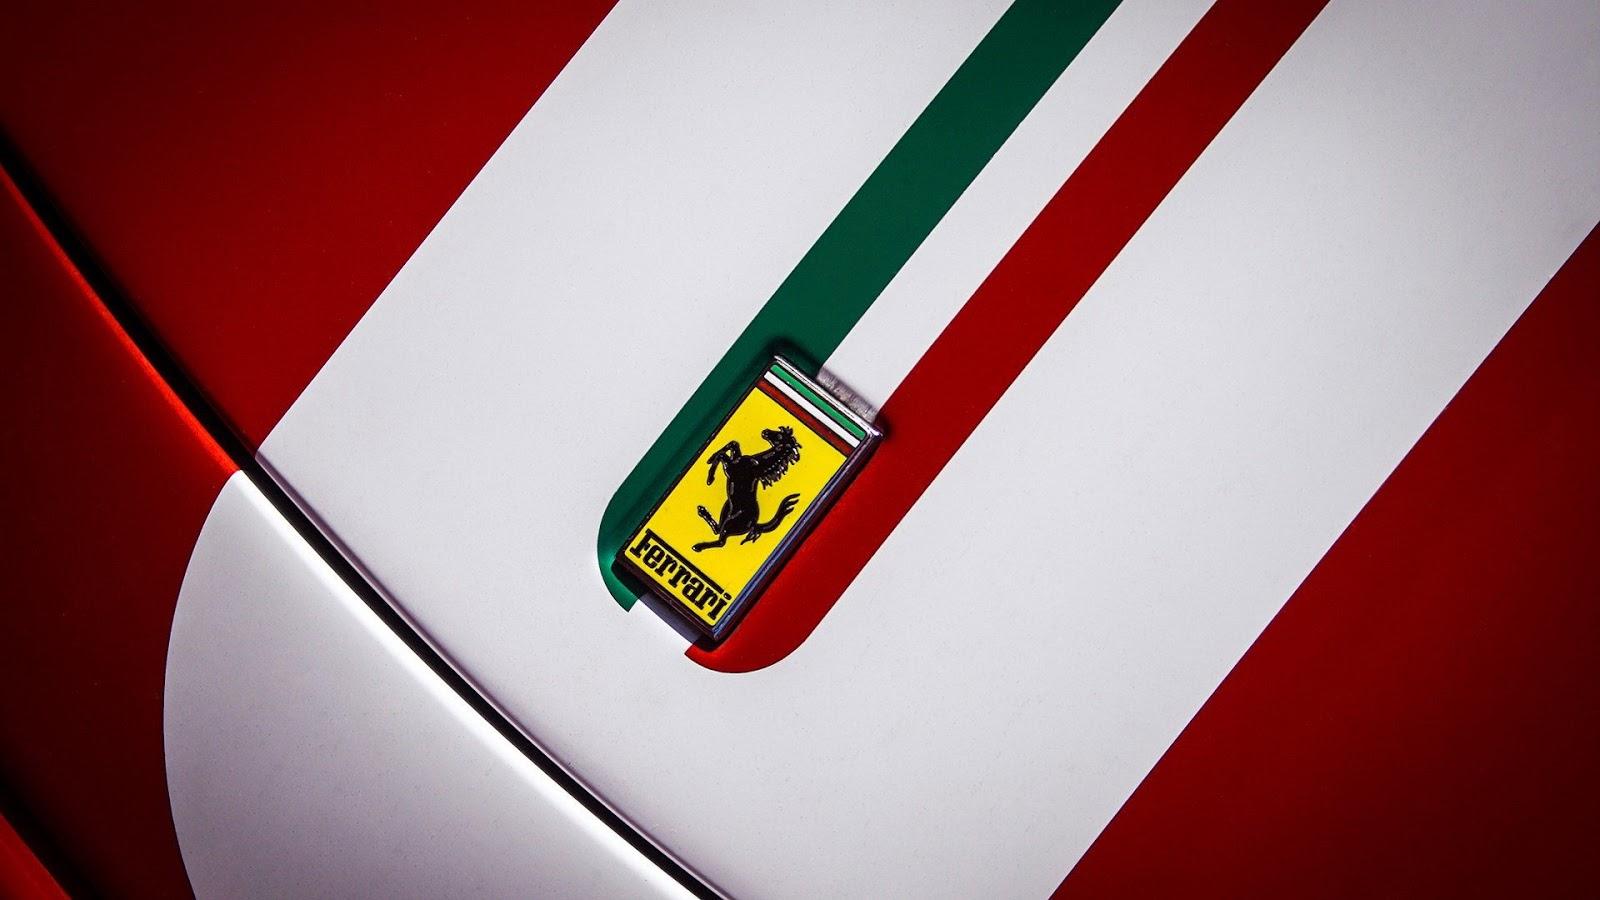 Hd Car Wallpapers 2560x1600 Ferrari Logo On Car Wallpaper